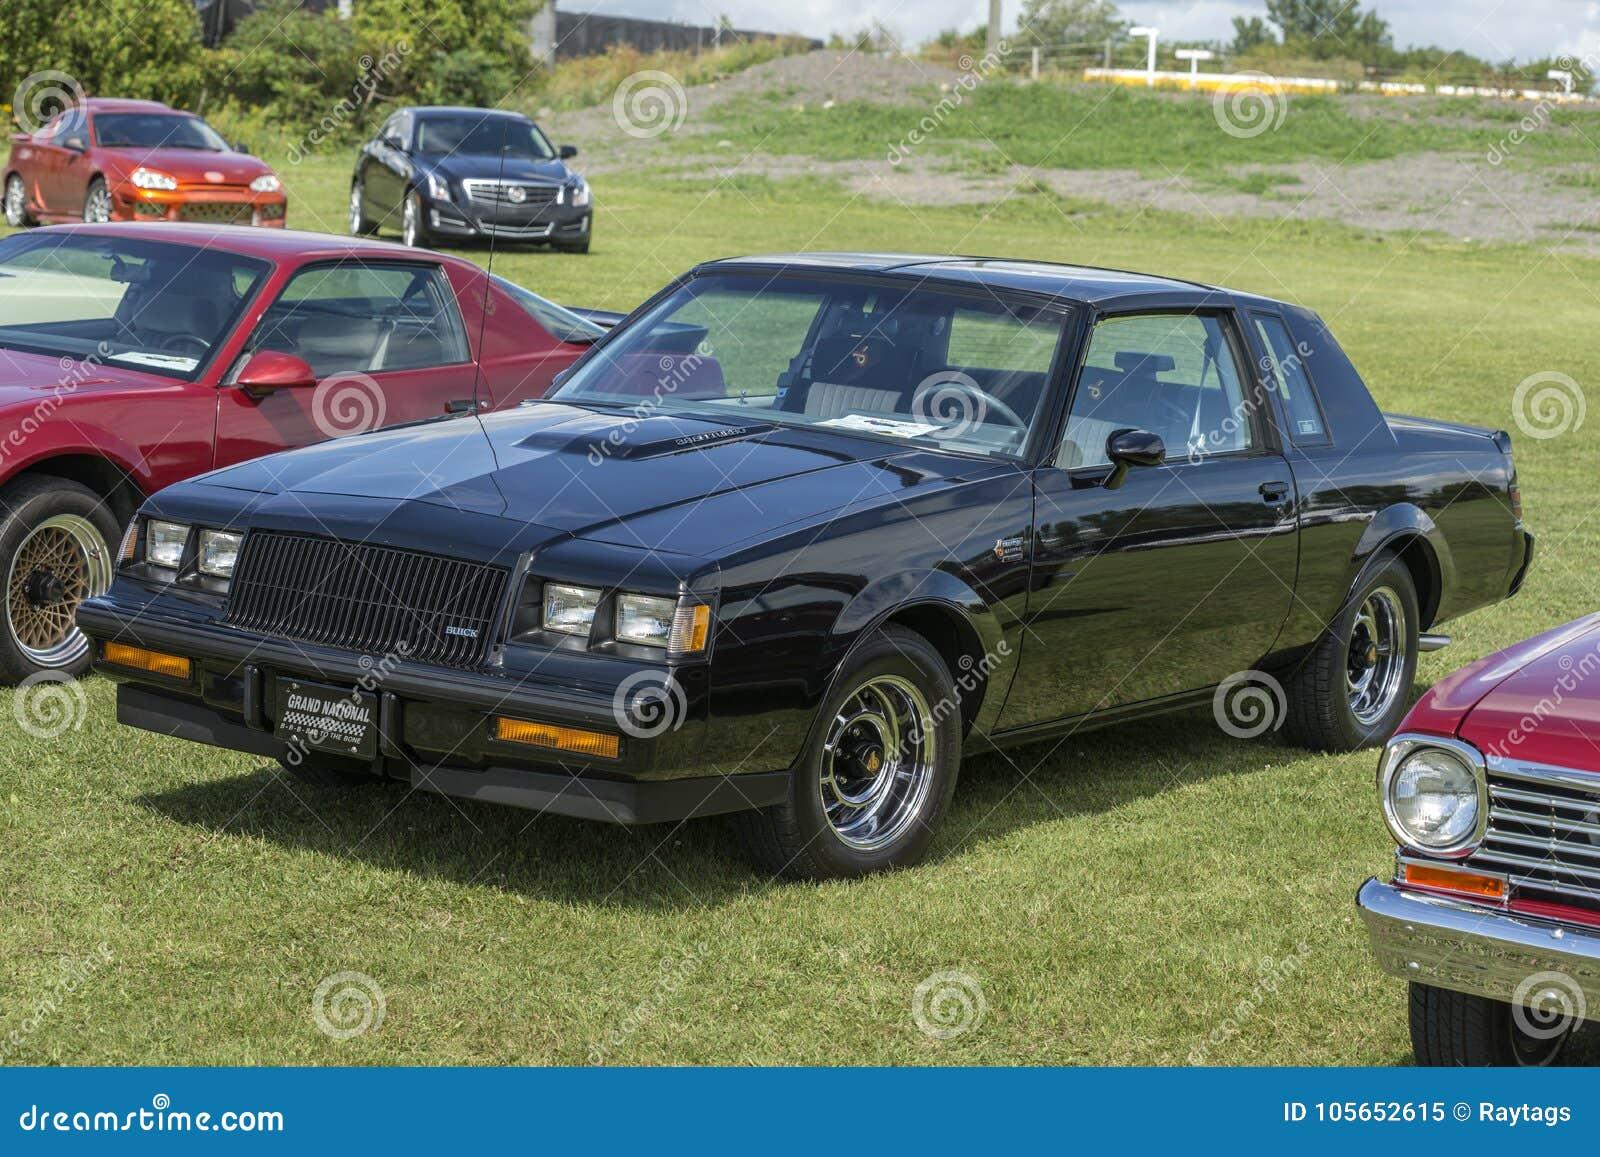 2017 Buick Grand National >> Buick Grand National Editorial Image Image Of Cars 105652615